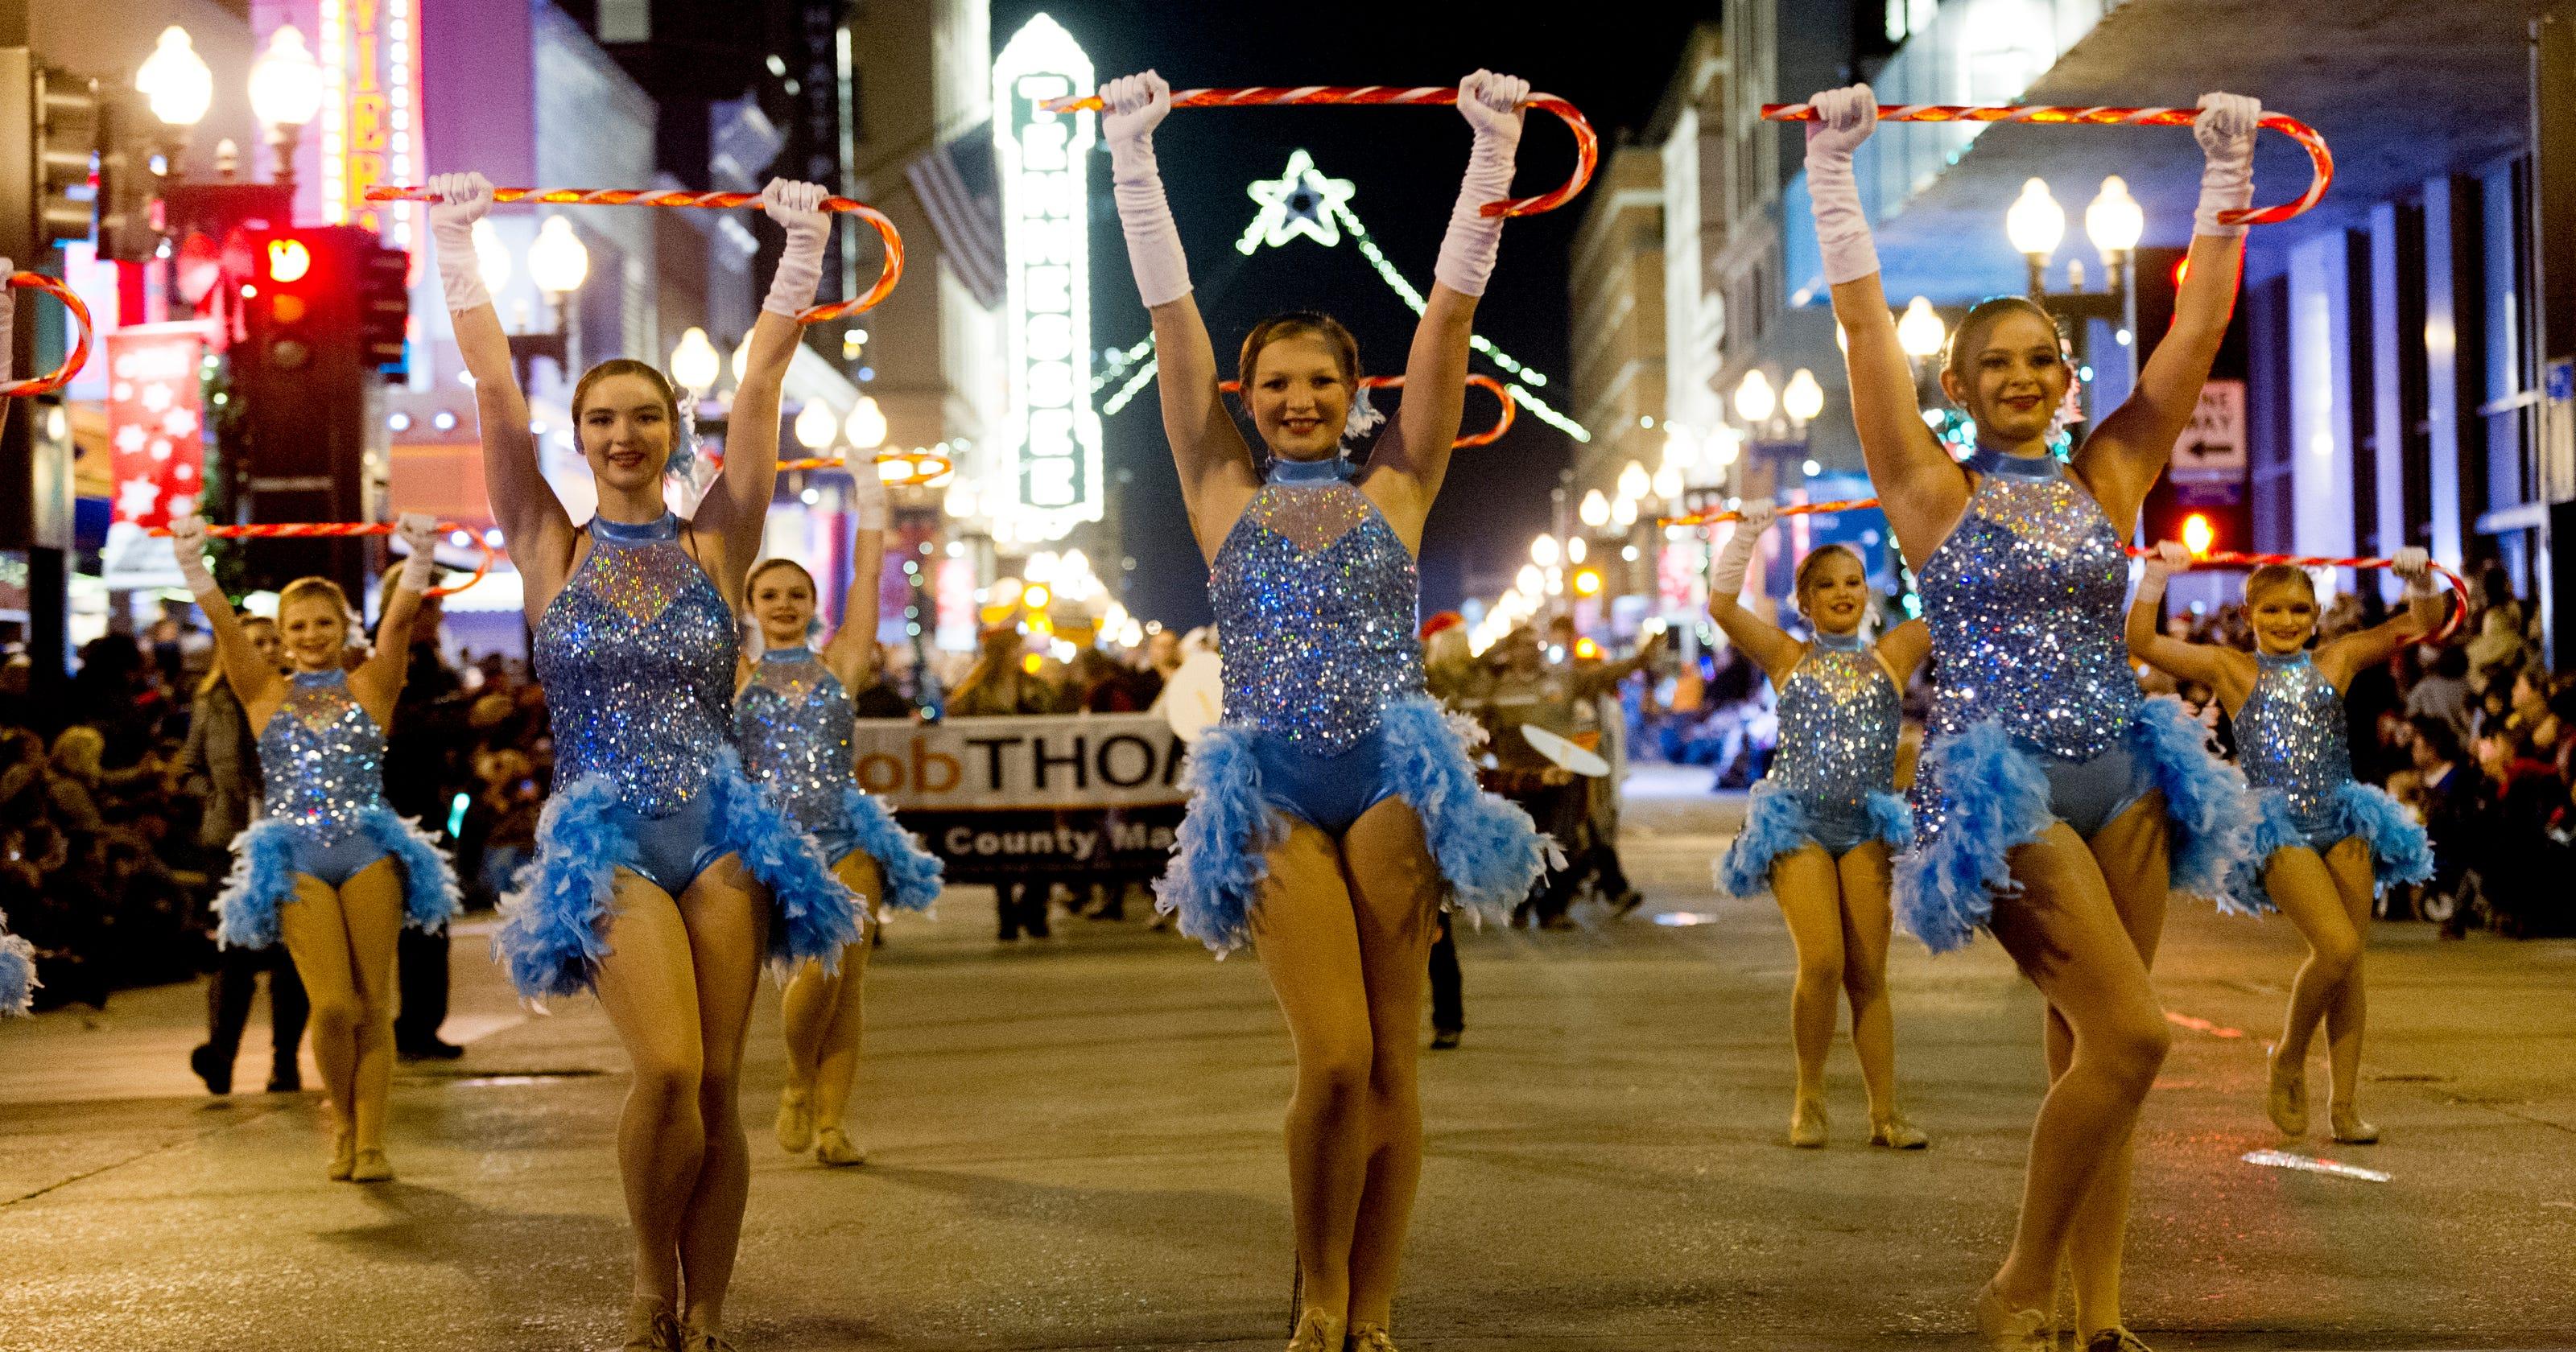 Powell Christmas Parade 2020 Powell Tn Christmas Parade 2020 Gatlinburg | Uatskn